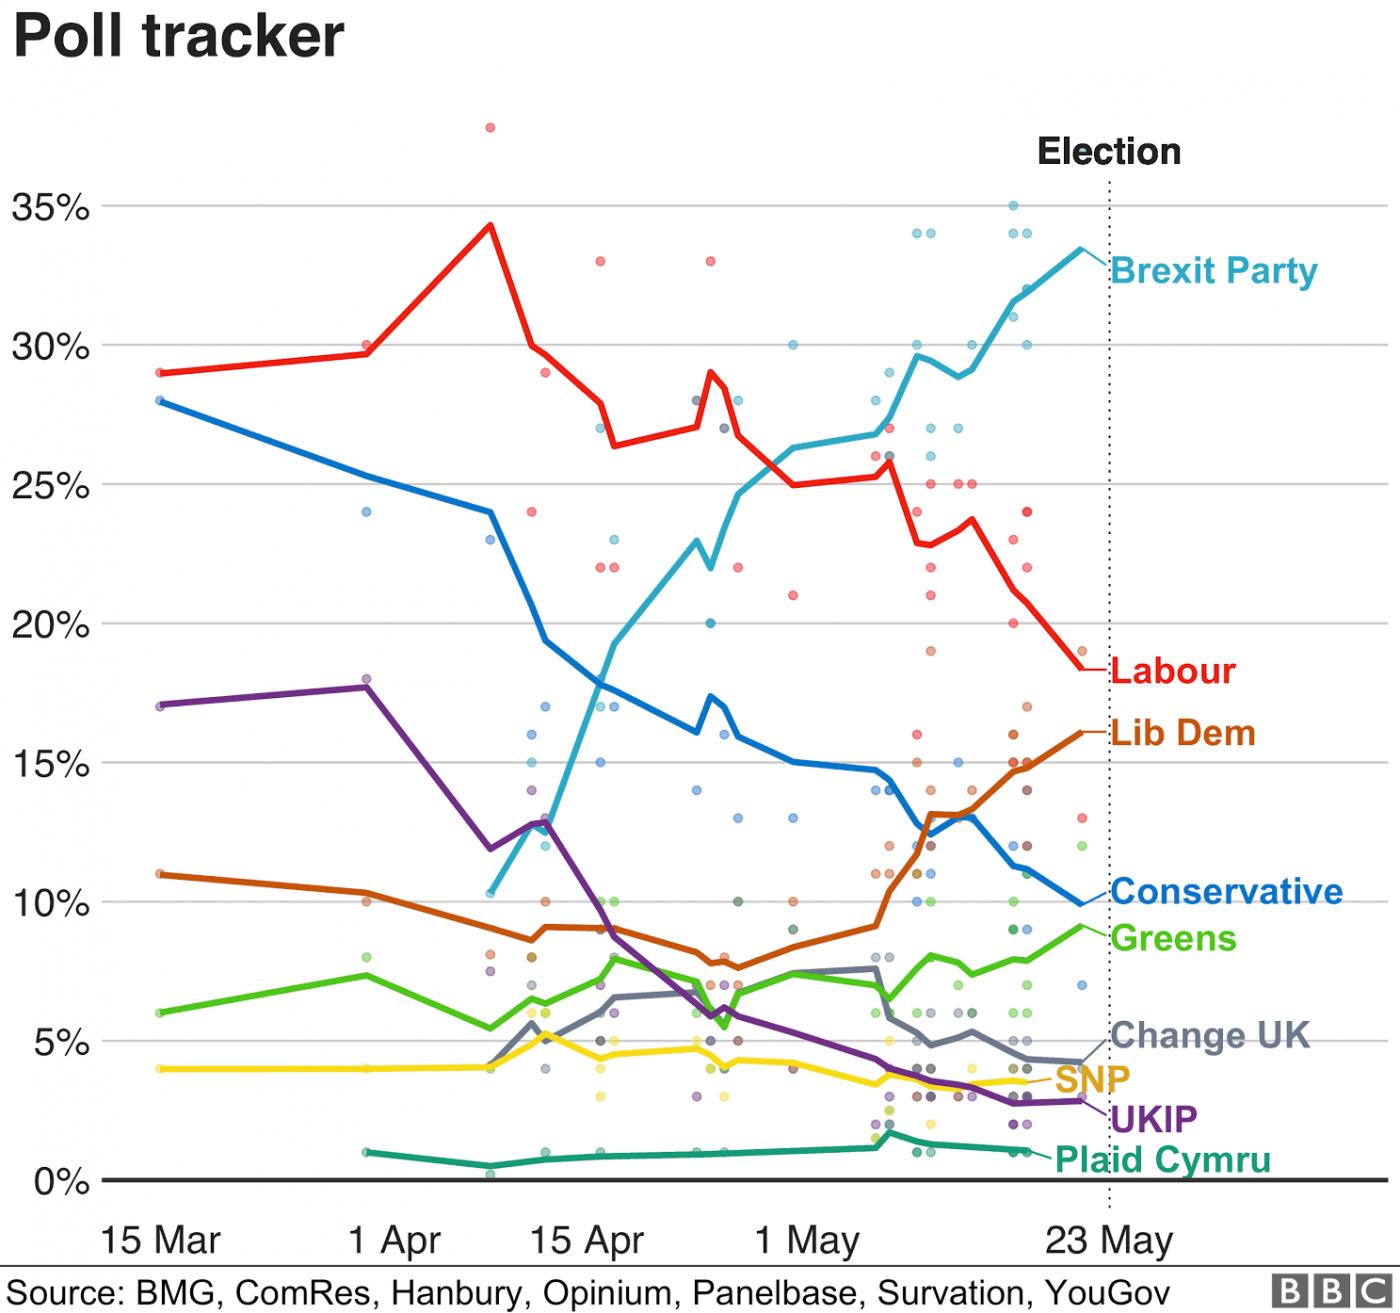 _107060194_optimised-uk_poll_tracker_2019-05-22-nc.png